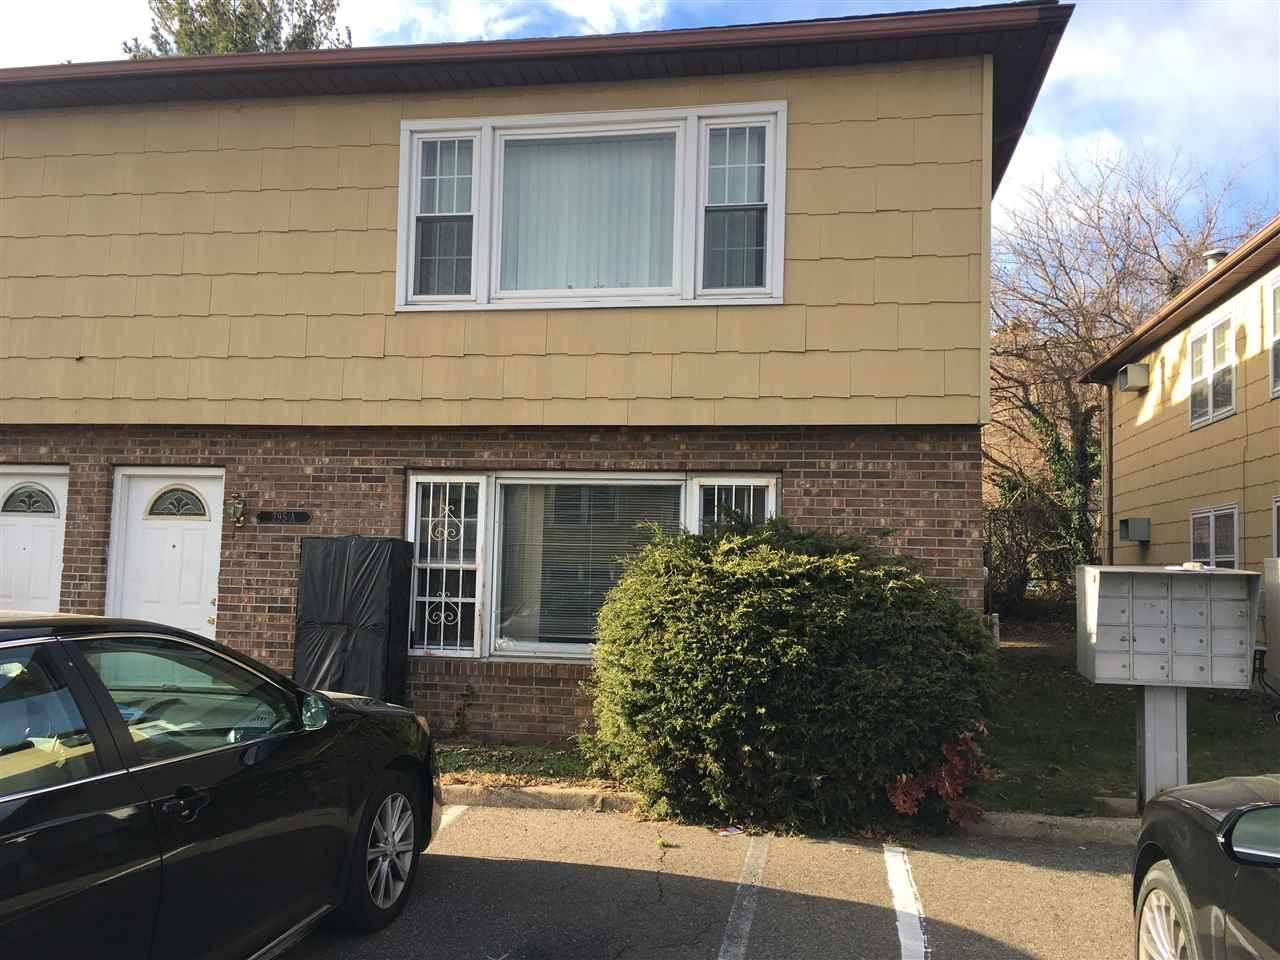 295A CLERK ST B1, JC, Greenville, NJ 07304